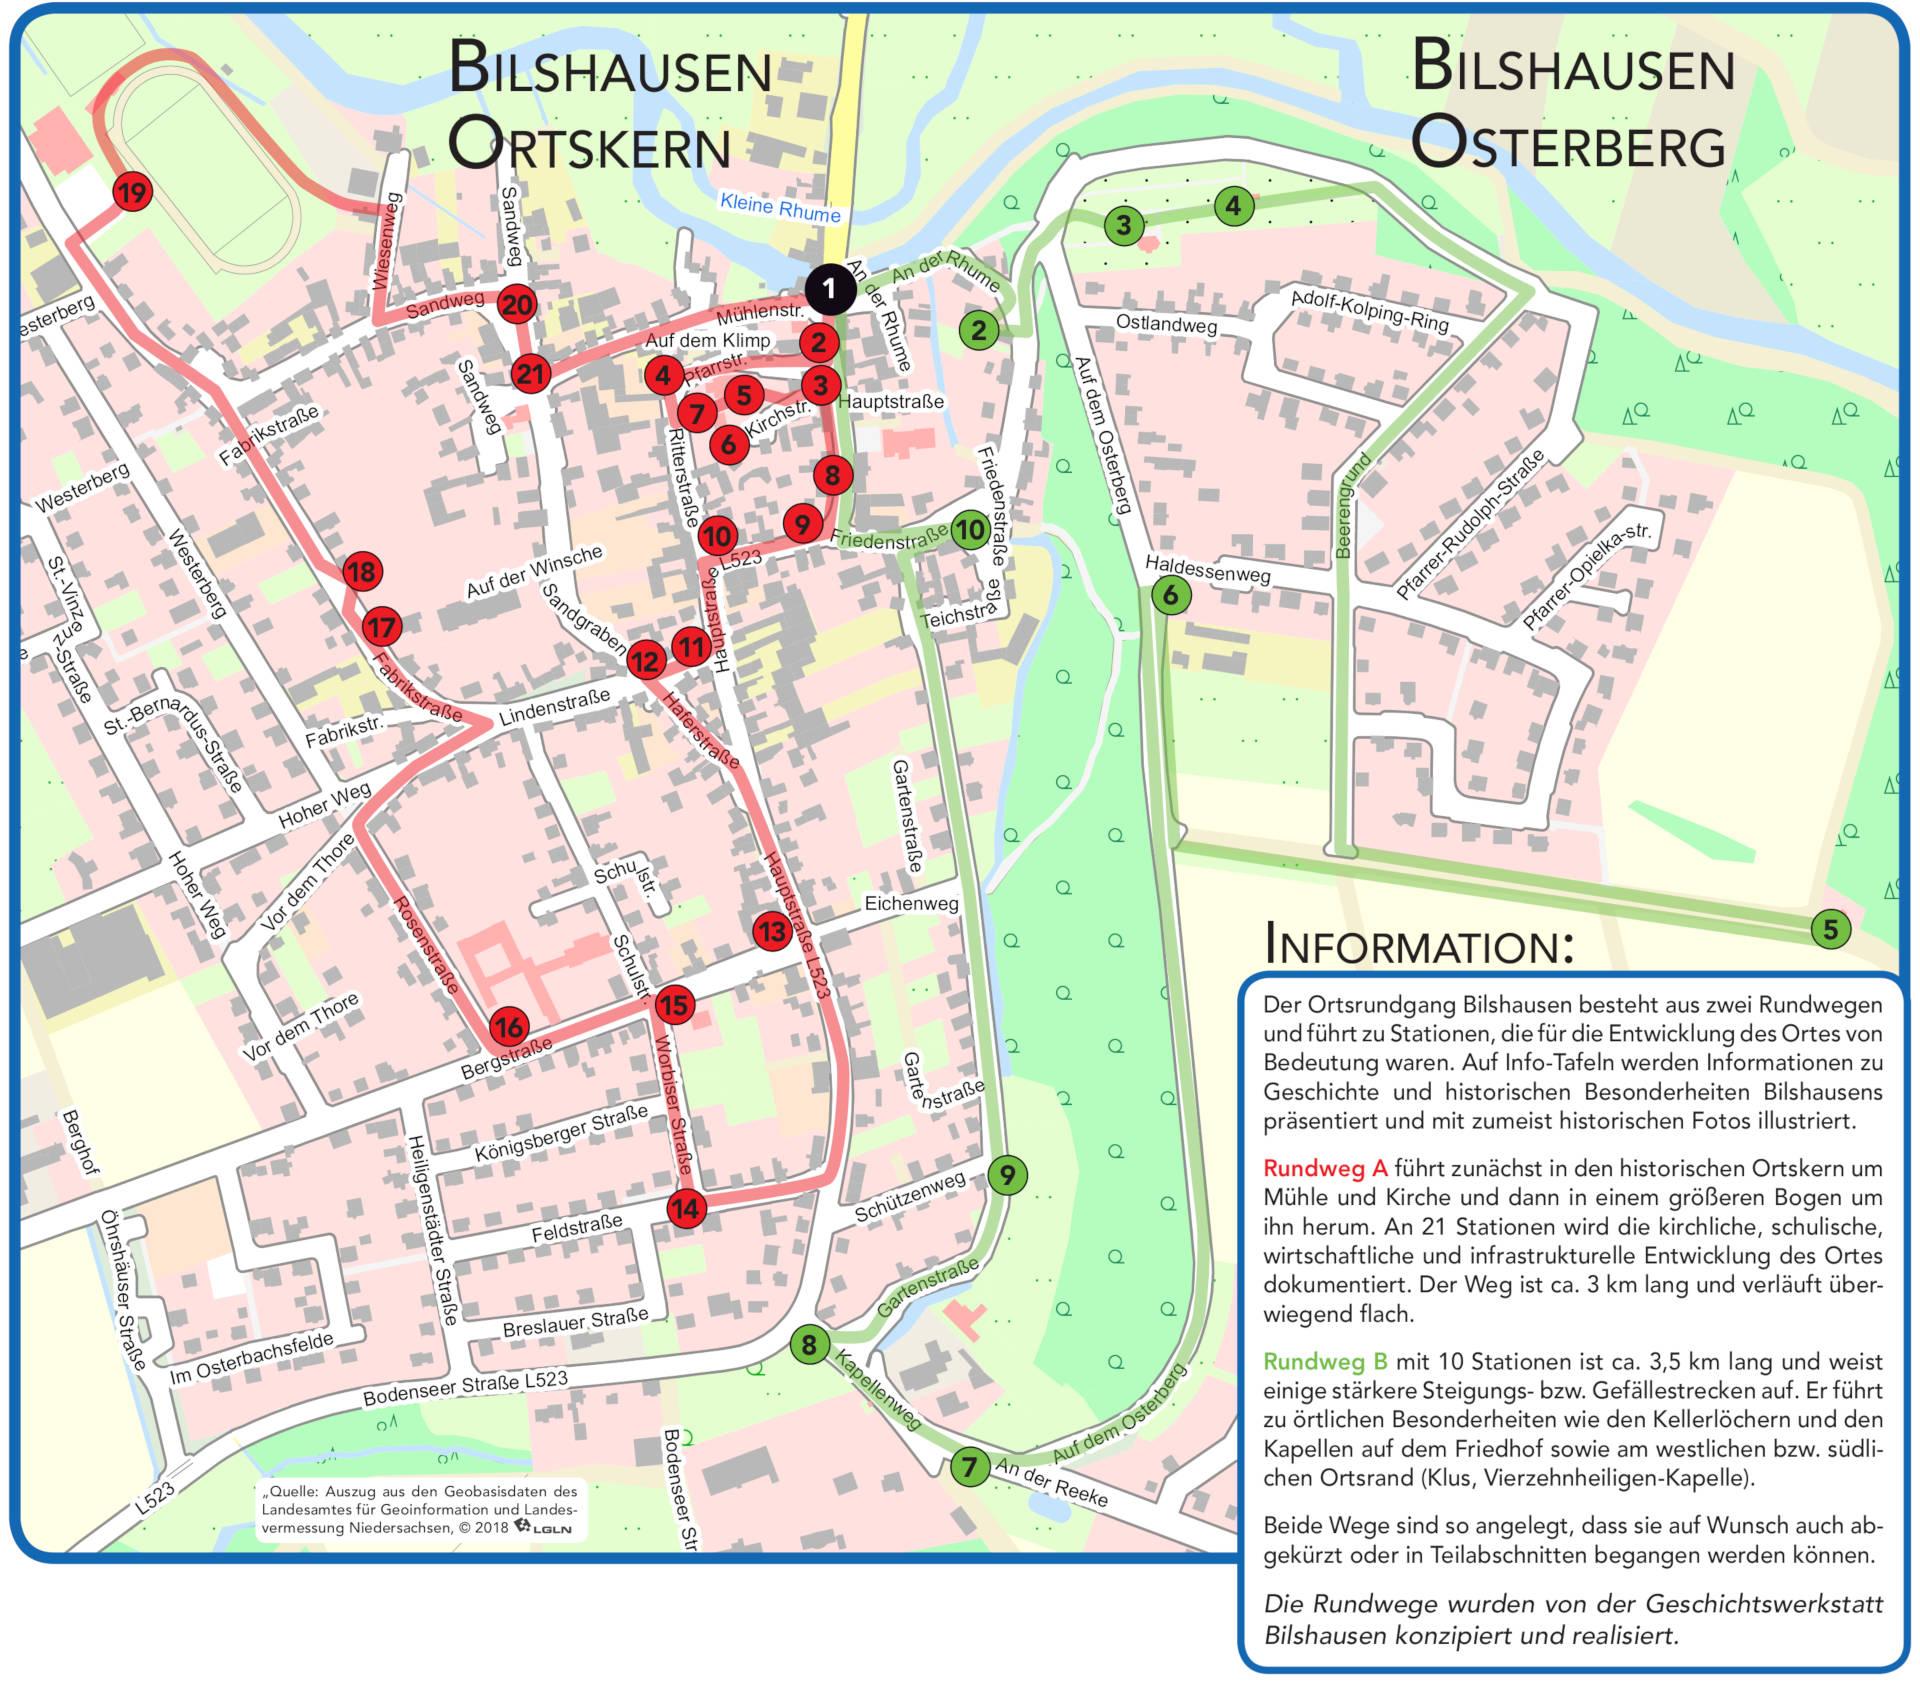 Ortsrundgang Bilshausen - Übersichtskarte